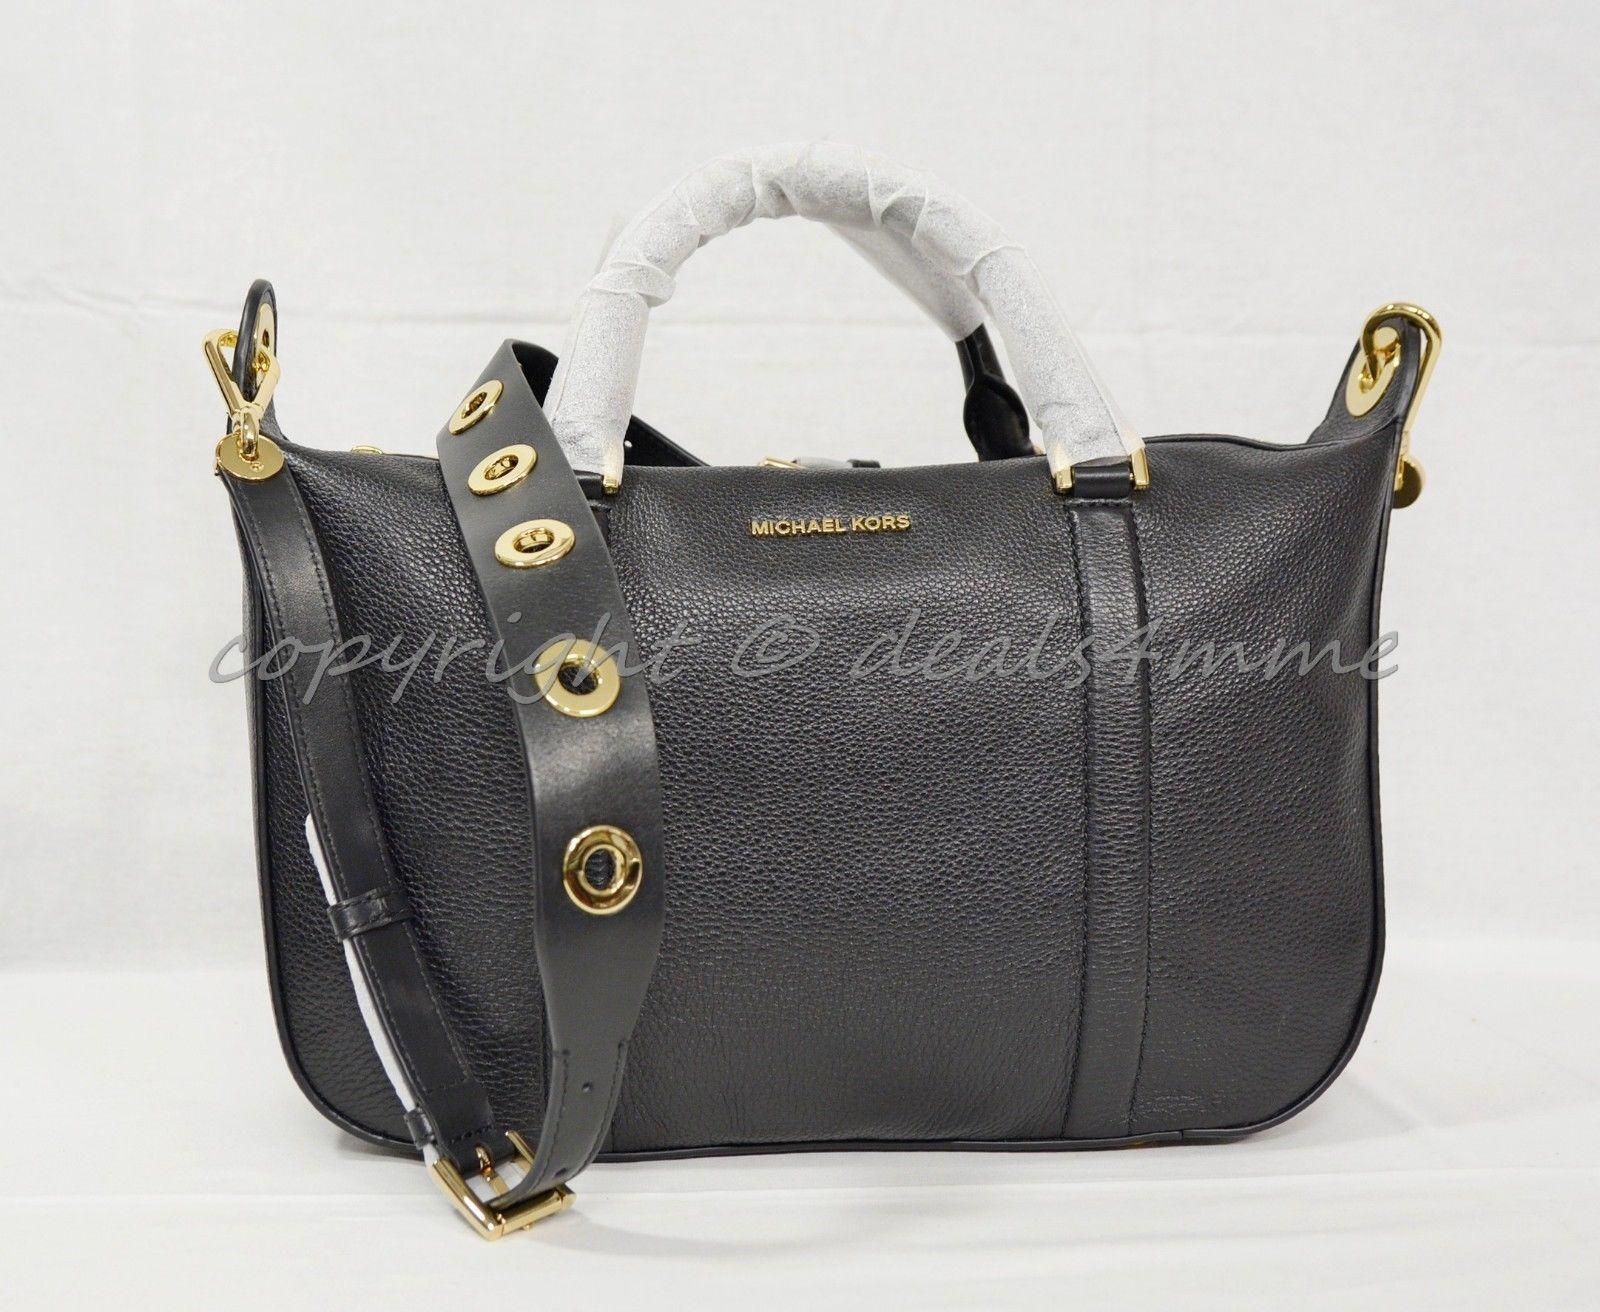 b3b4bd6a35b7 Michael Kors Raven Grommet Large Leather and 50 similar items. S l1600